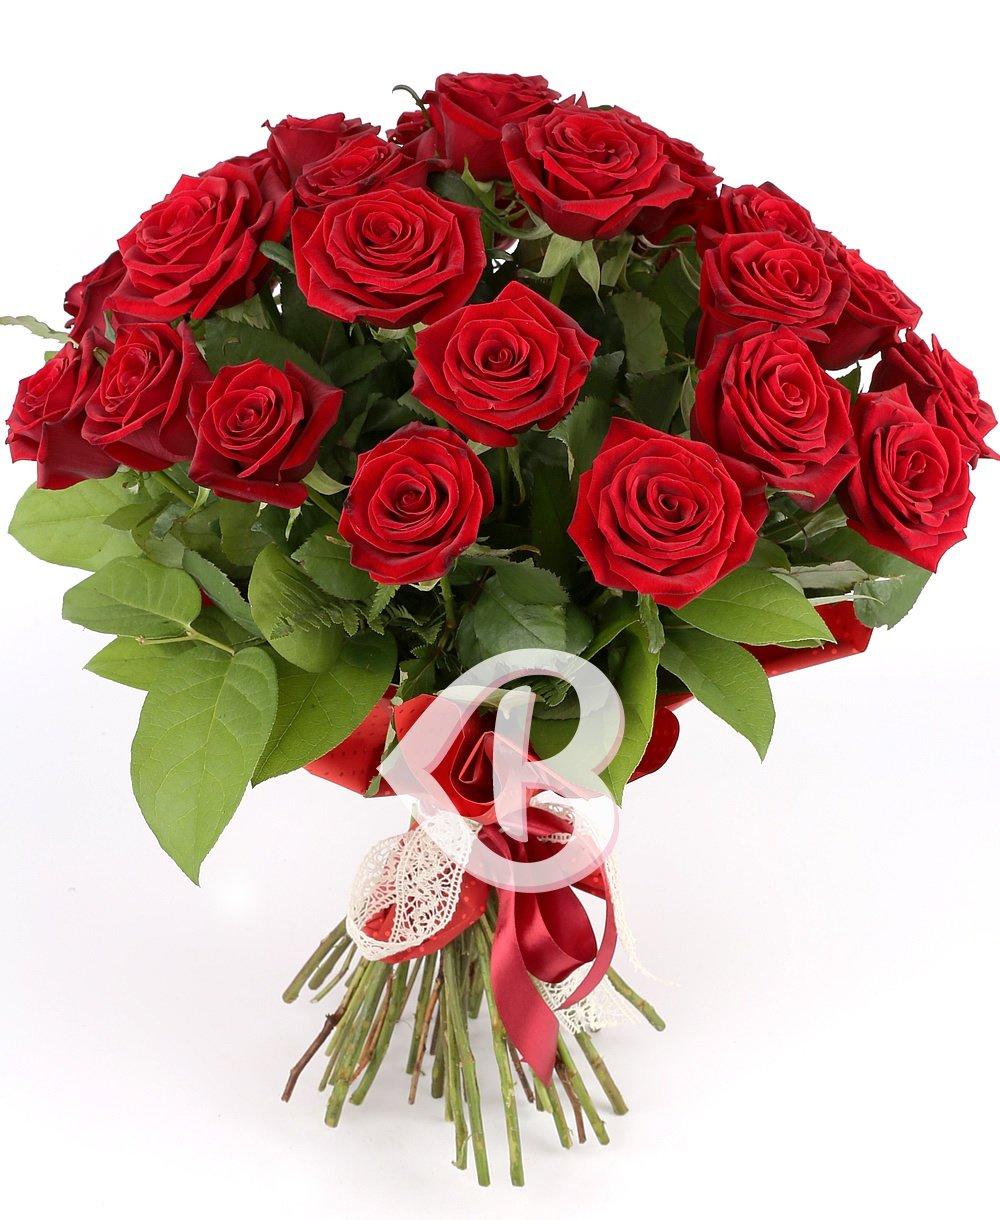 Imaginea produsului 29 Trandafiri Roșii